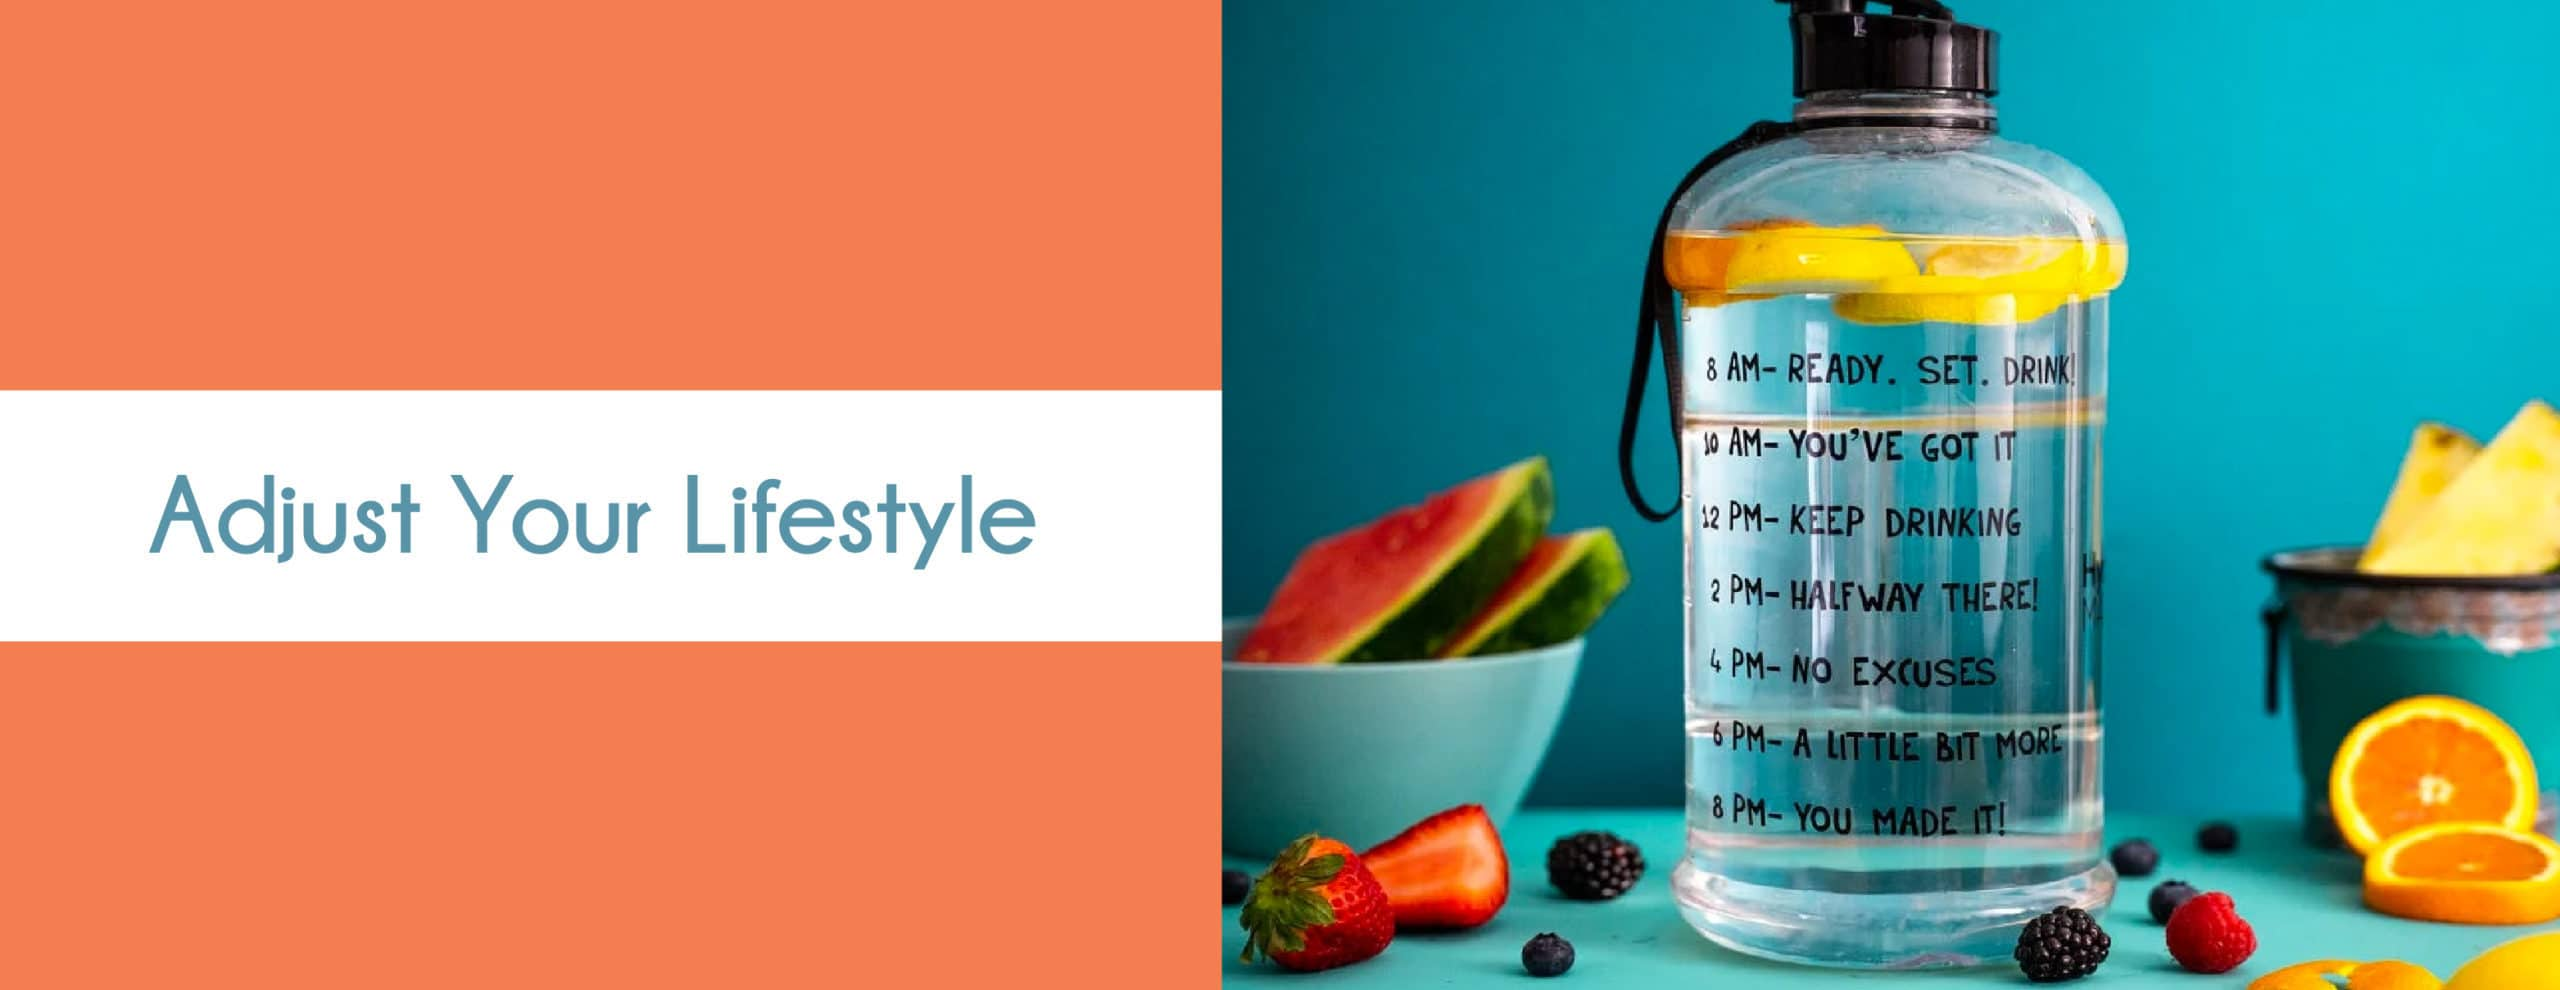 Adjust Your Lifestyle